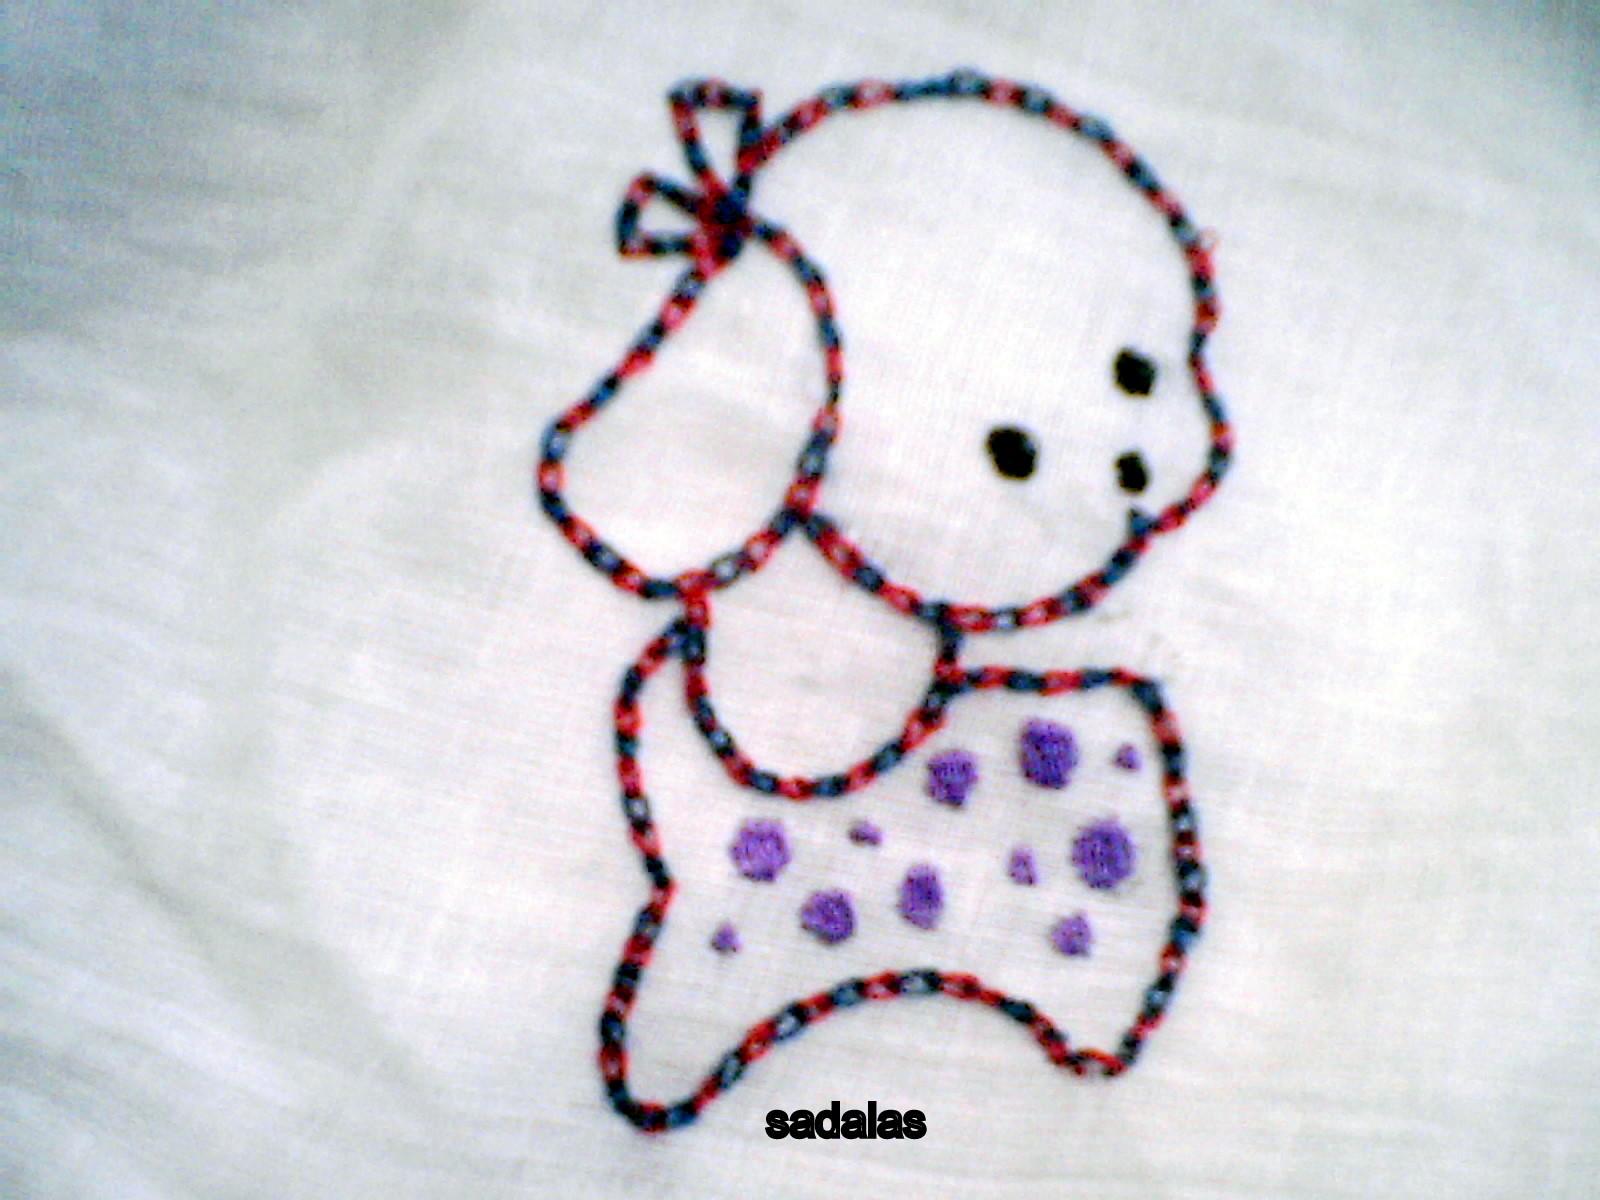 Sadala's Embroidery: Magic Chain Stitch